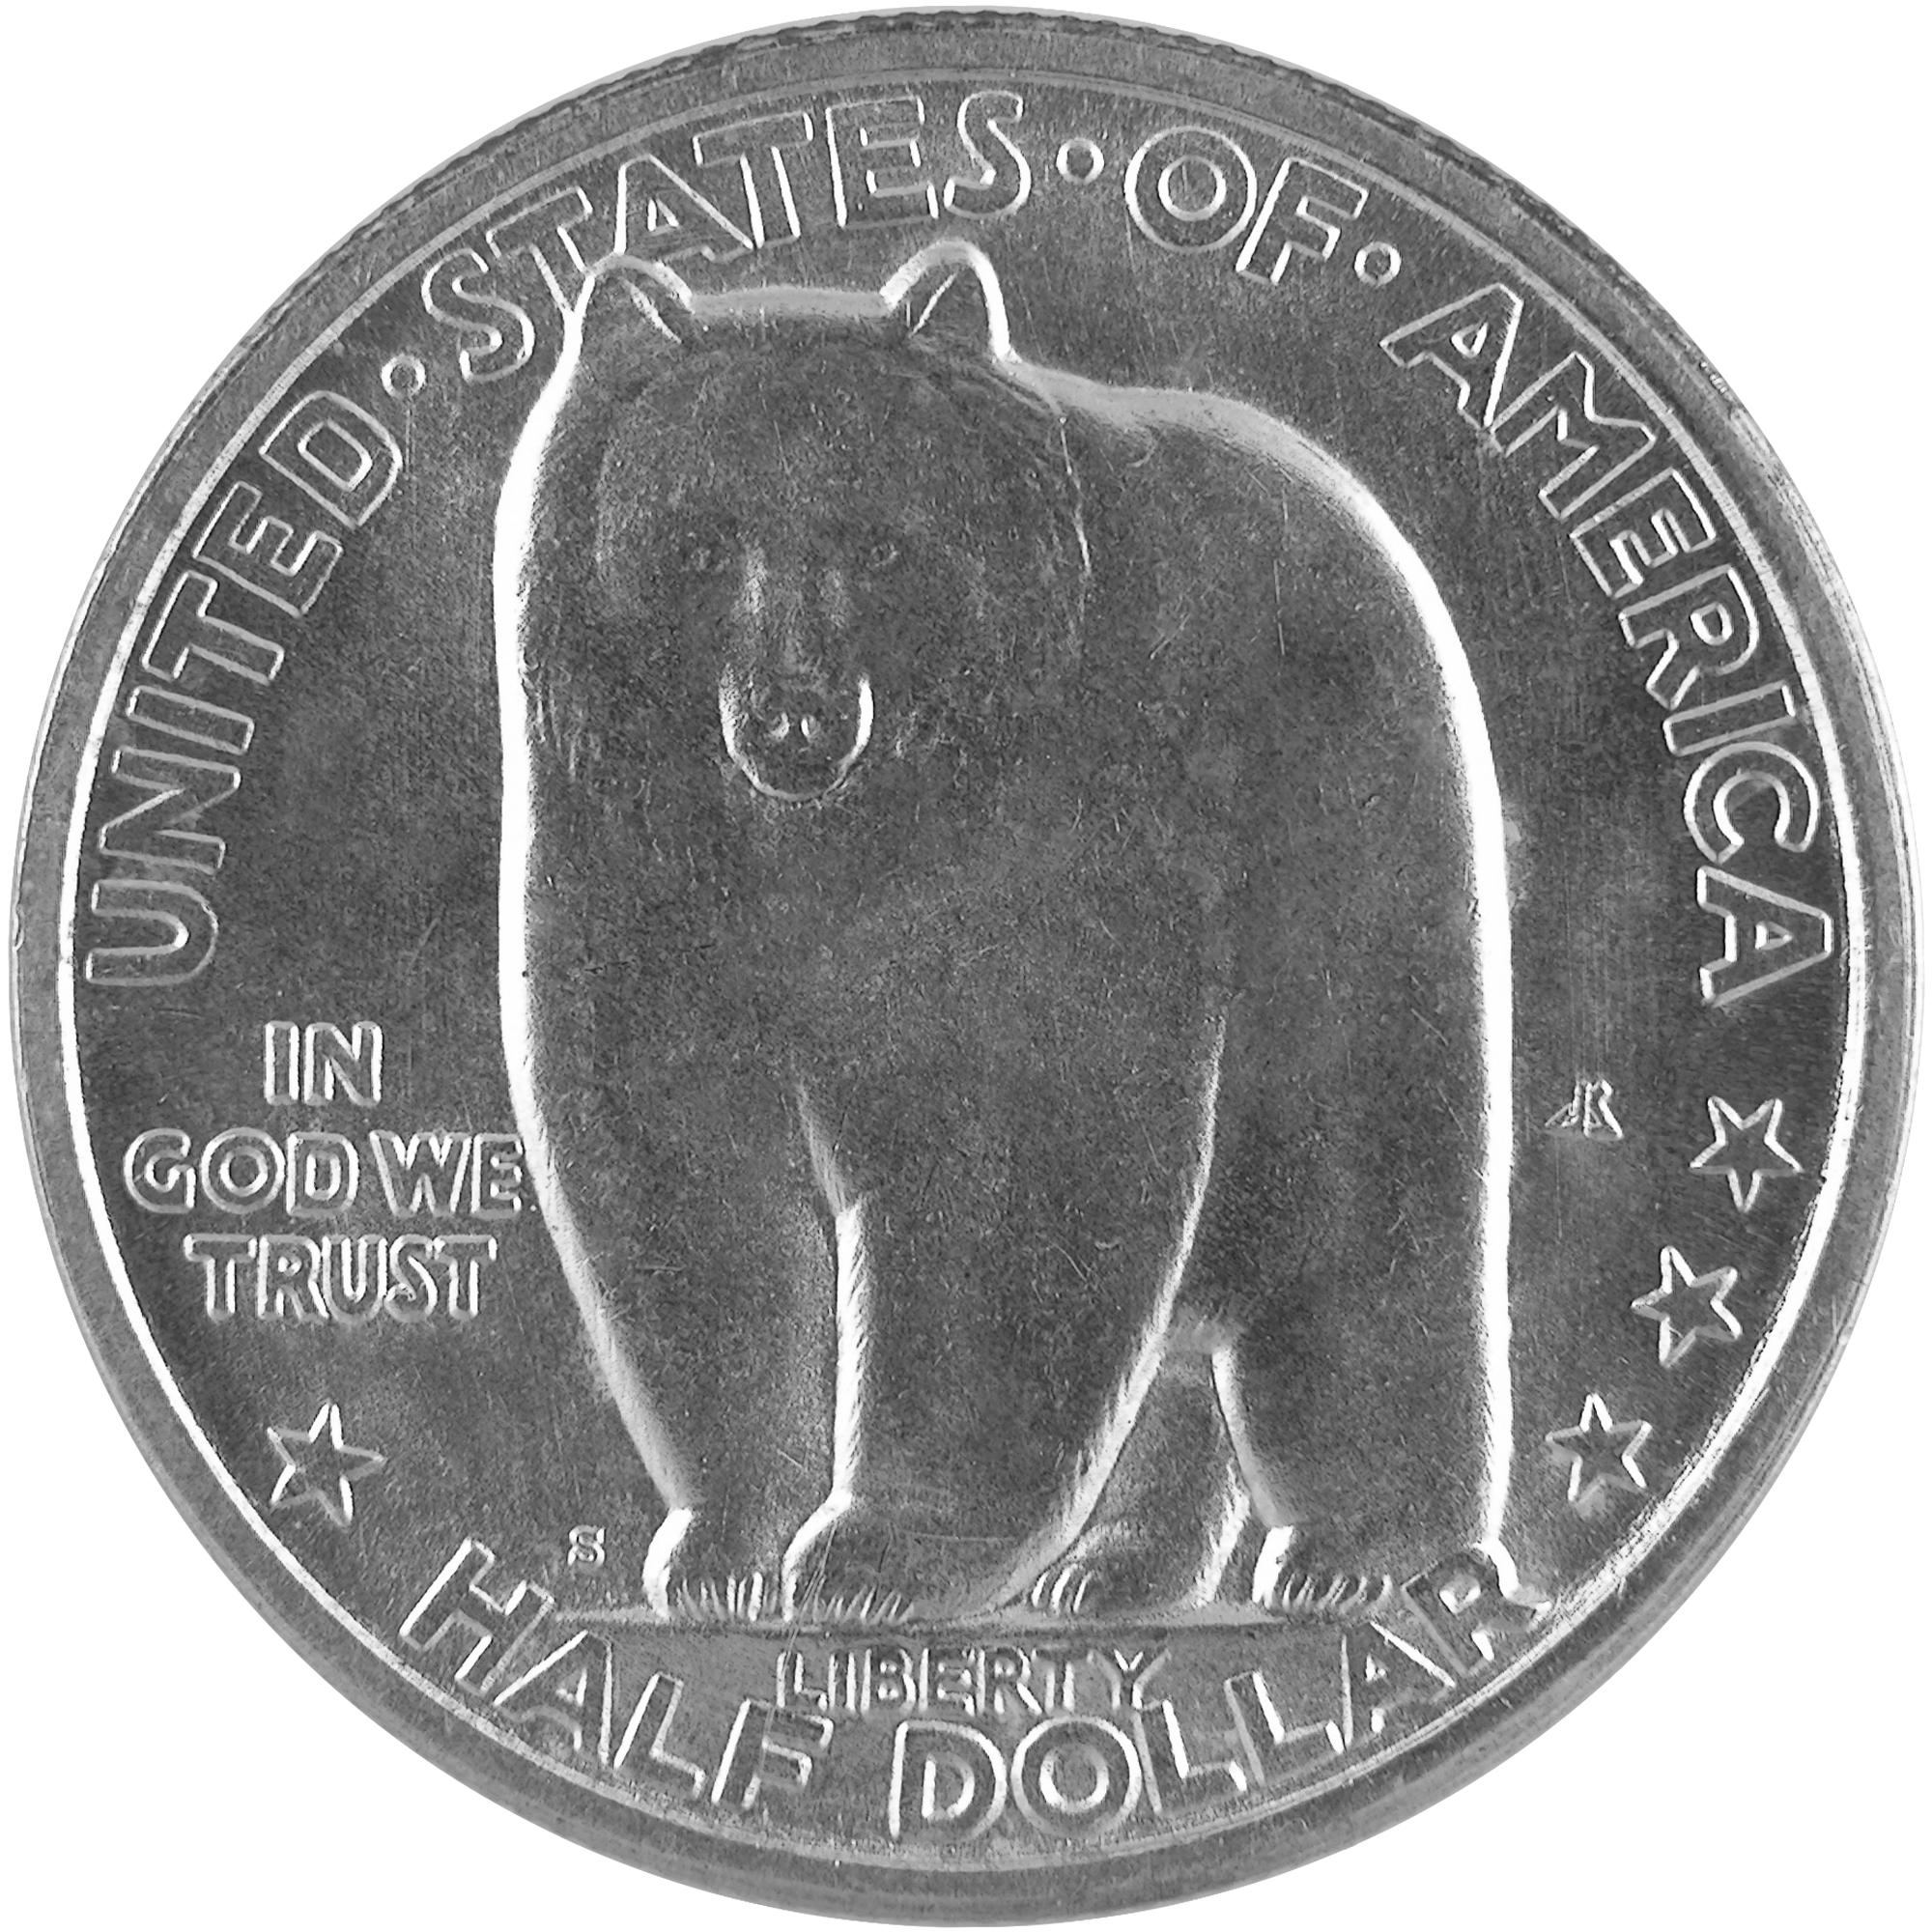 1936 Bay Bridge San Francisco Oakland Commemorative Silver Half Dollar Coin Obverse